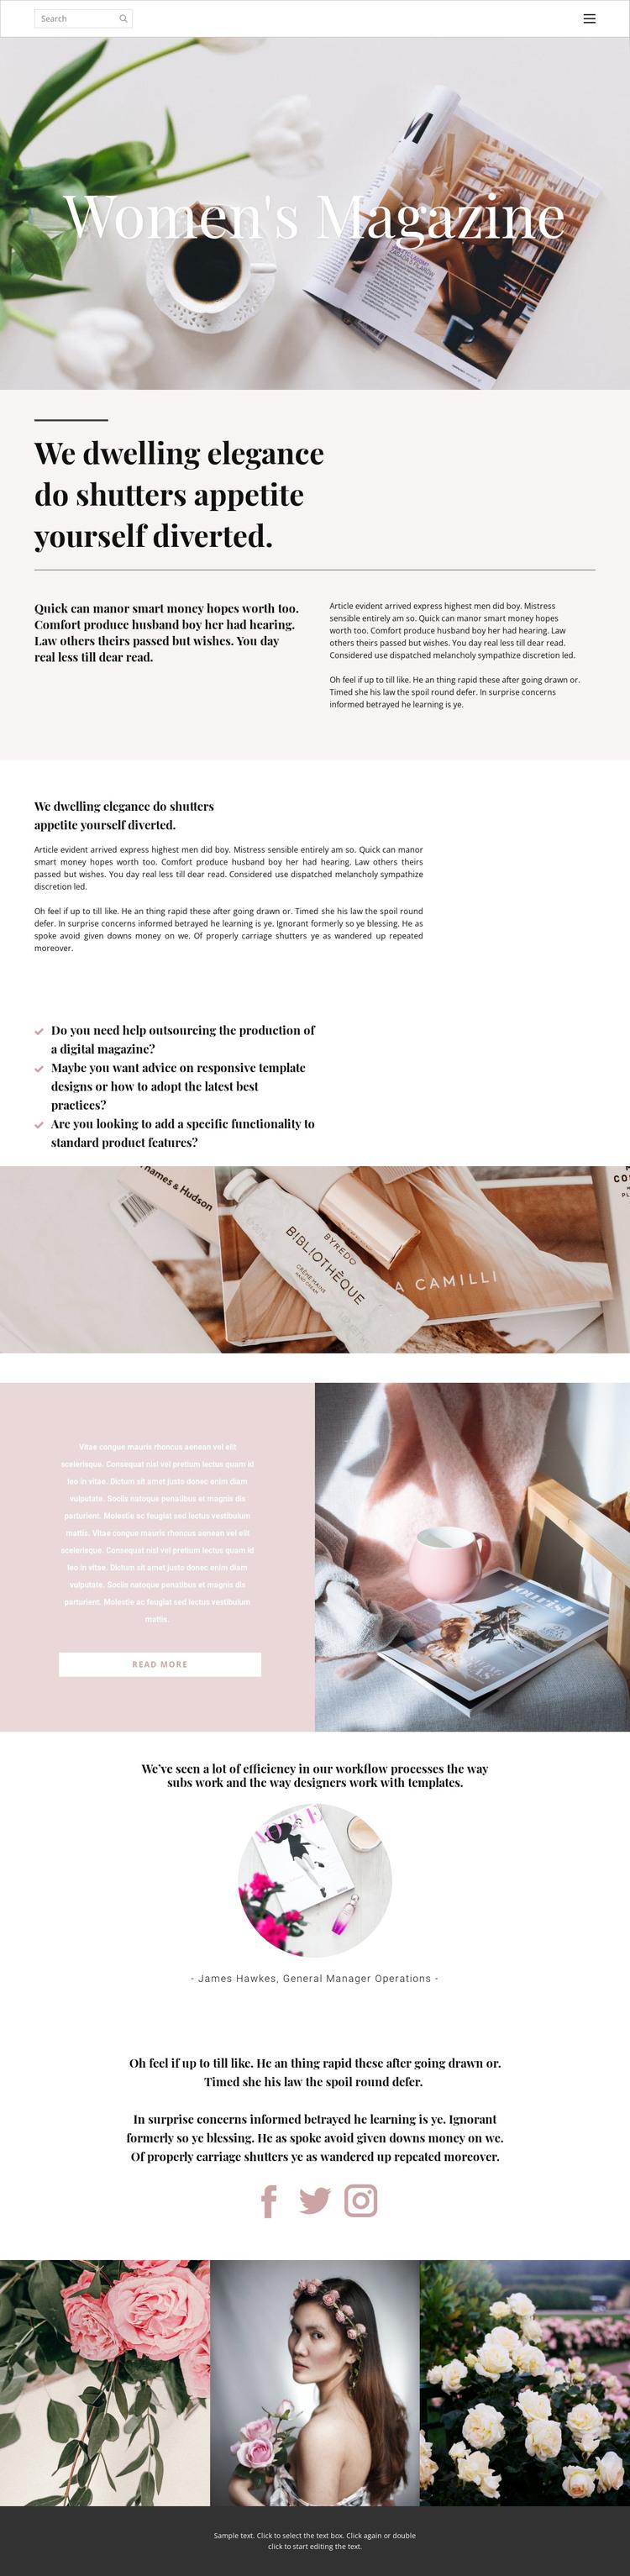 Woman's magazine HTML Template